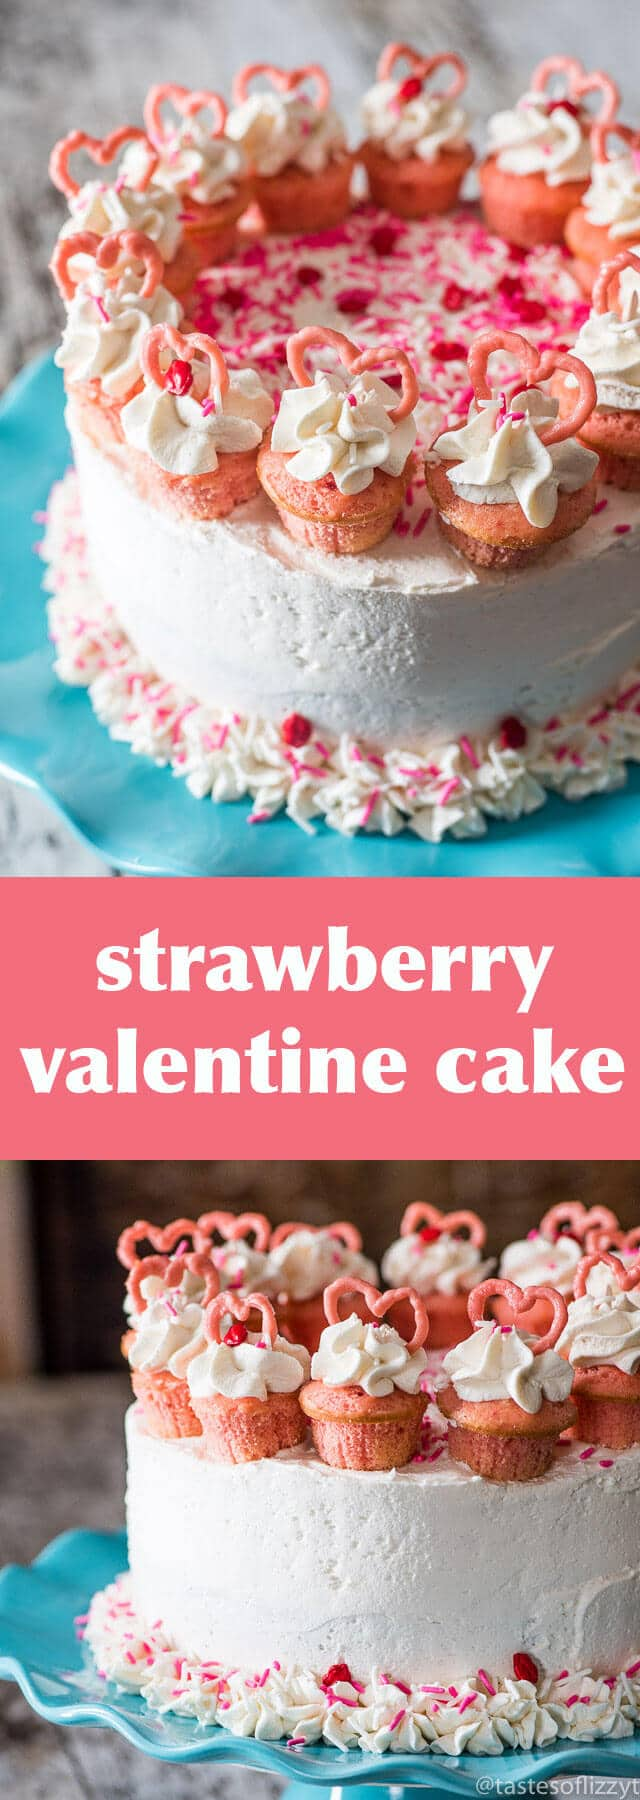 Strawberry Buttercream Cake Calories